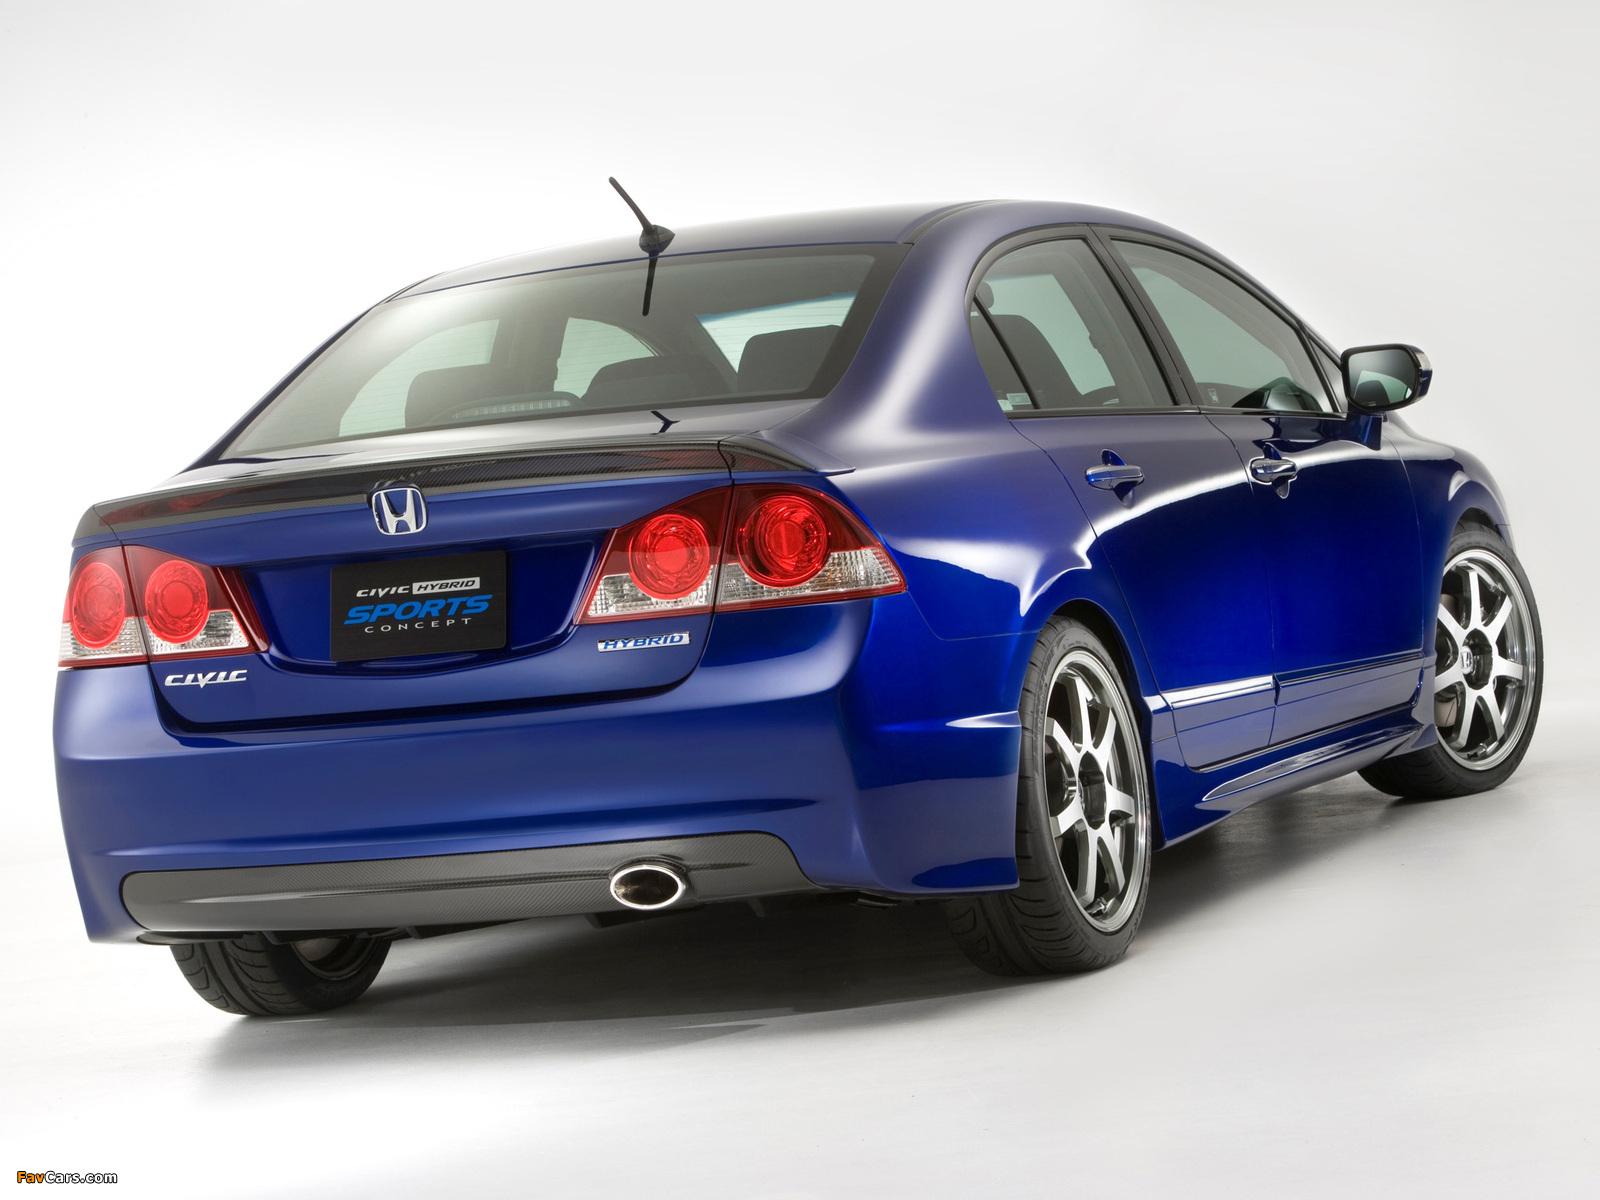 Honda Sports Car >> Honda Civic Hybrid Sports Concept 2006 wallpapers (1600x1200)